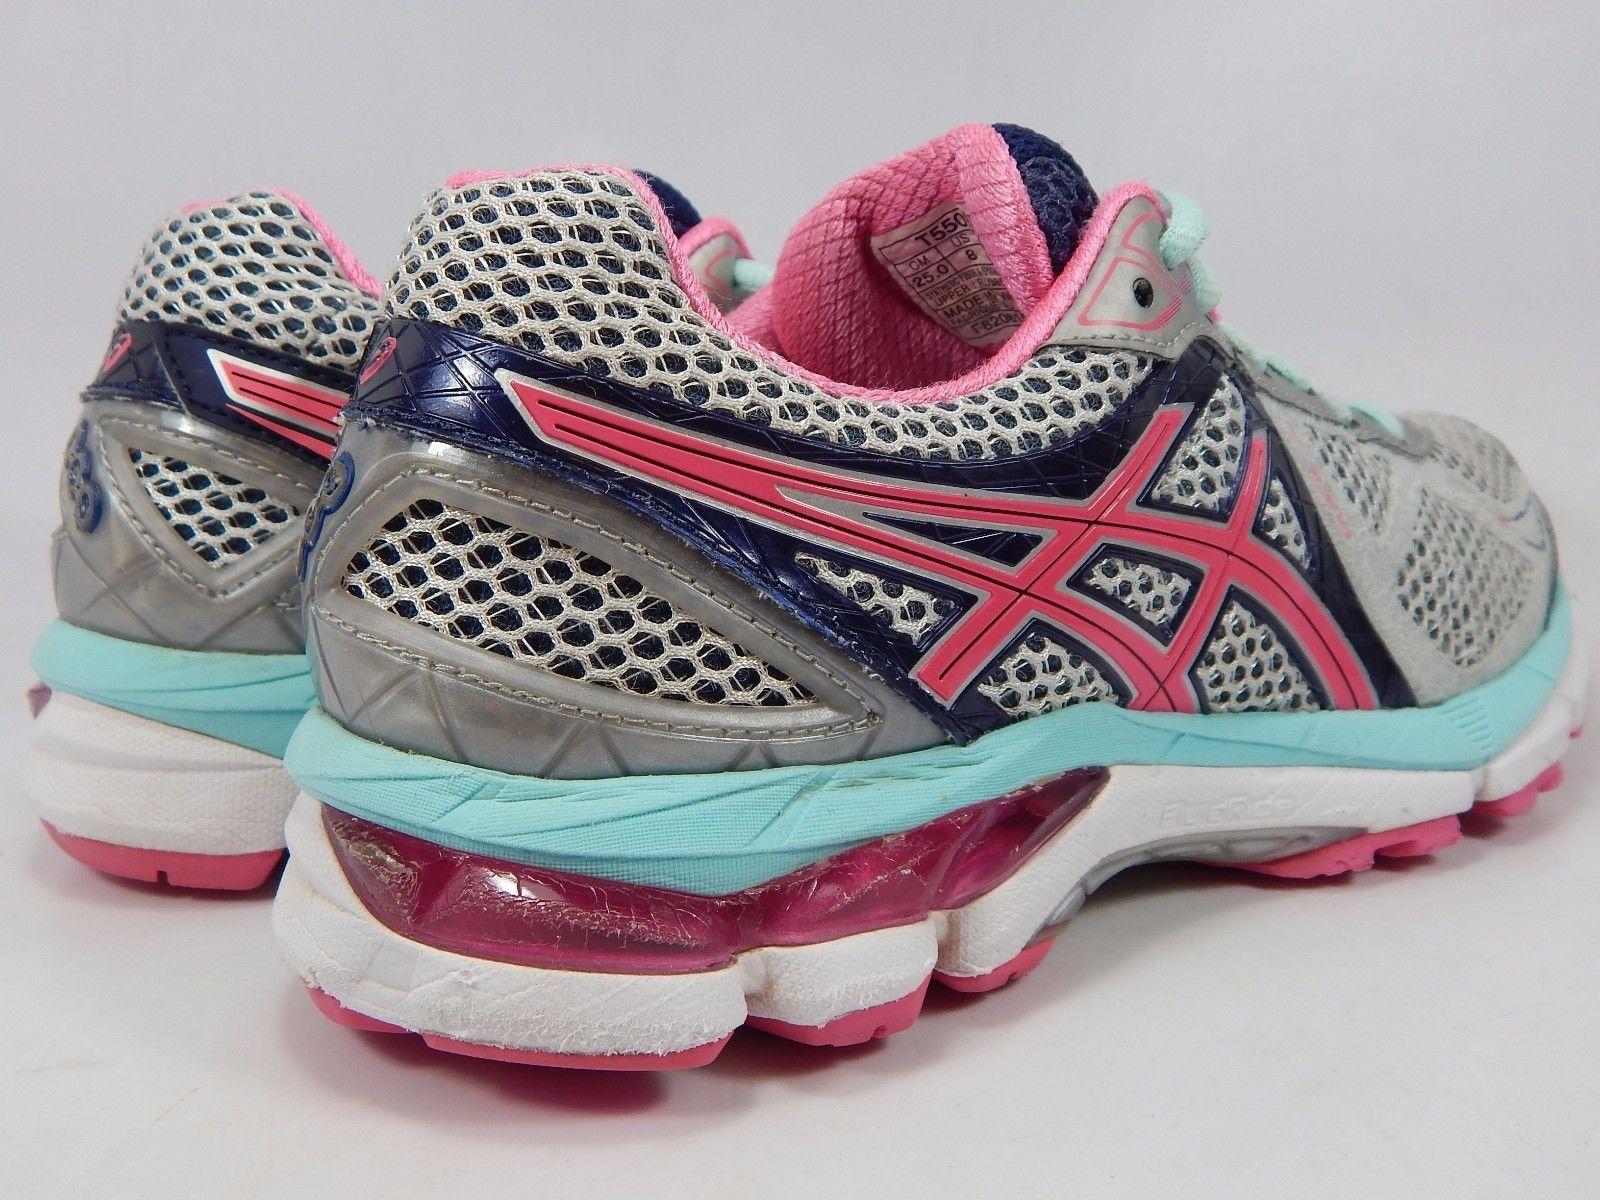 Asics GT 2000 v 3 Women's Running Shoes Size US 8 M (B) EU 39.5 Pink GrayT550N